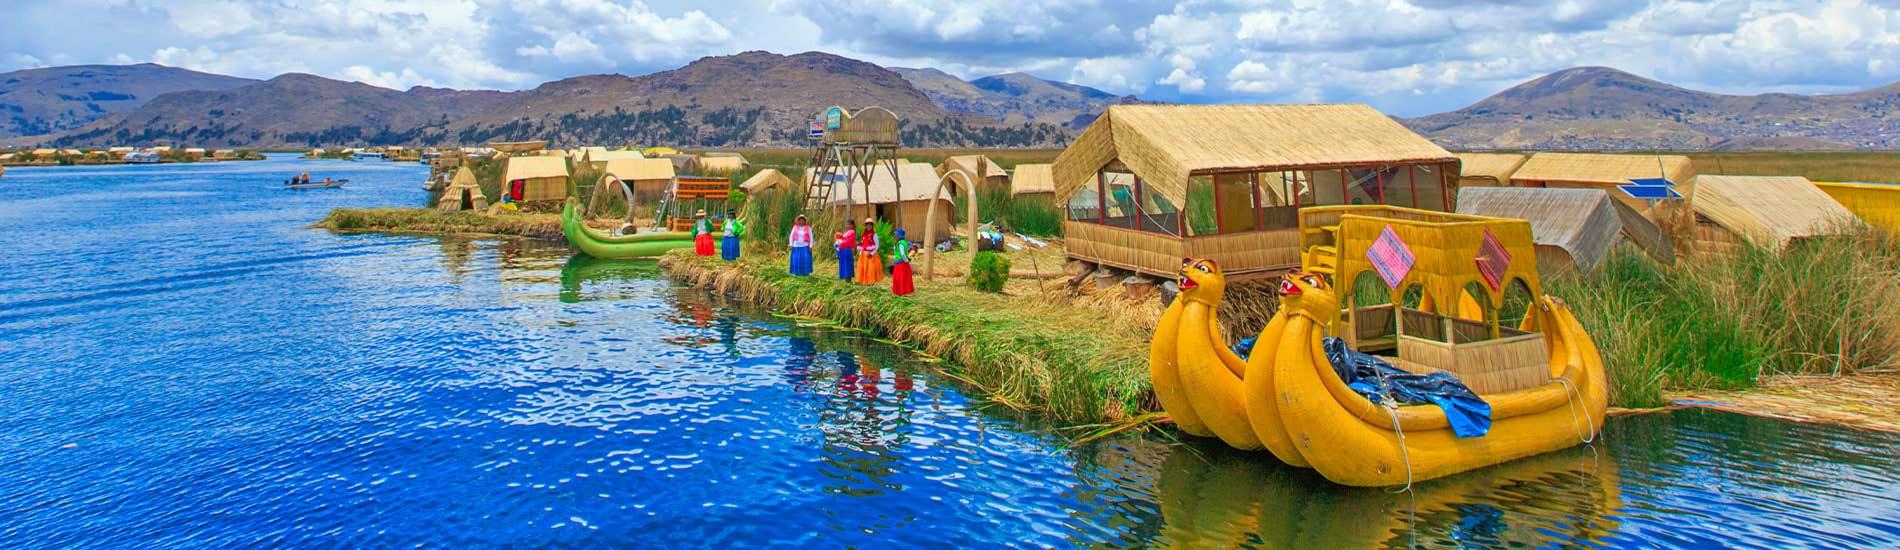 Lake Titicaca Uros Island